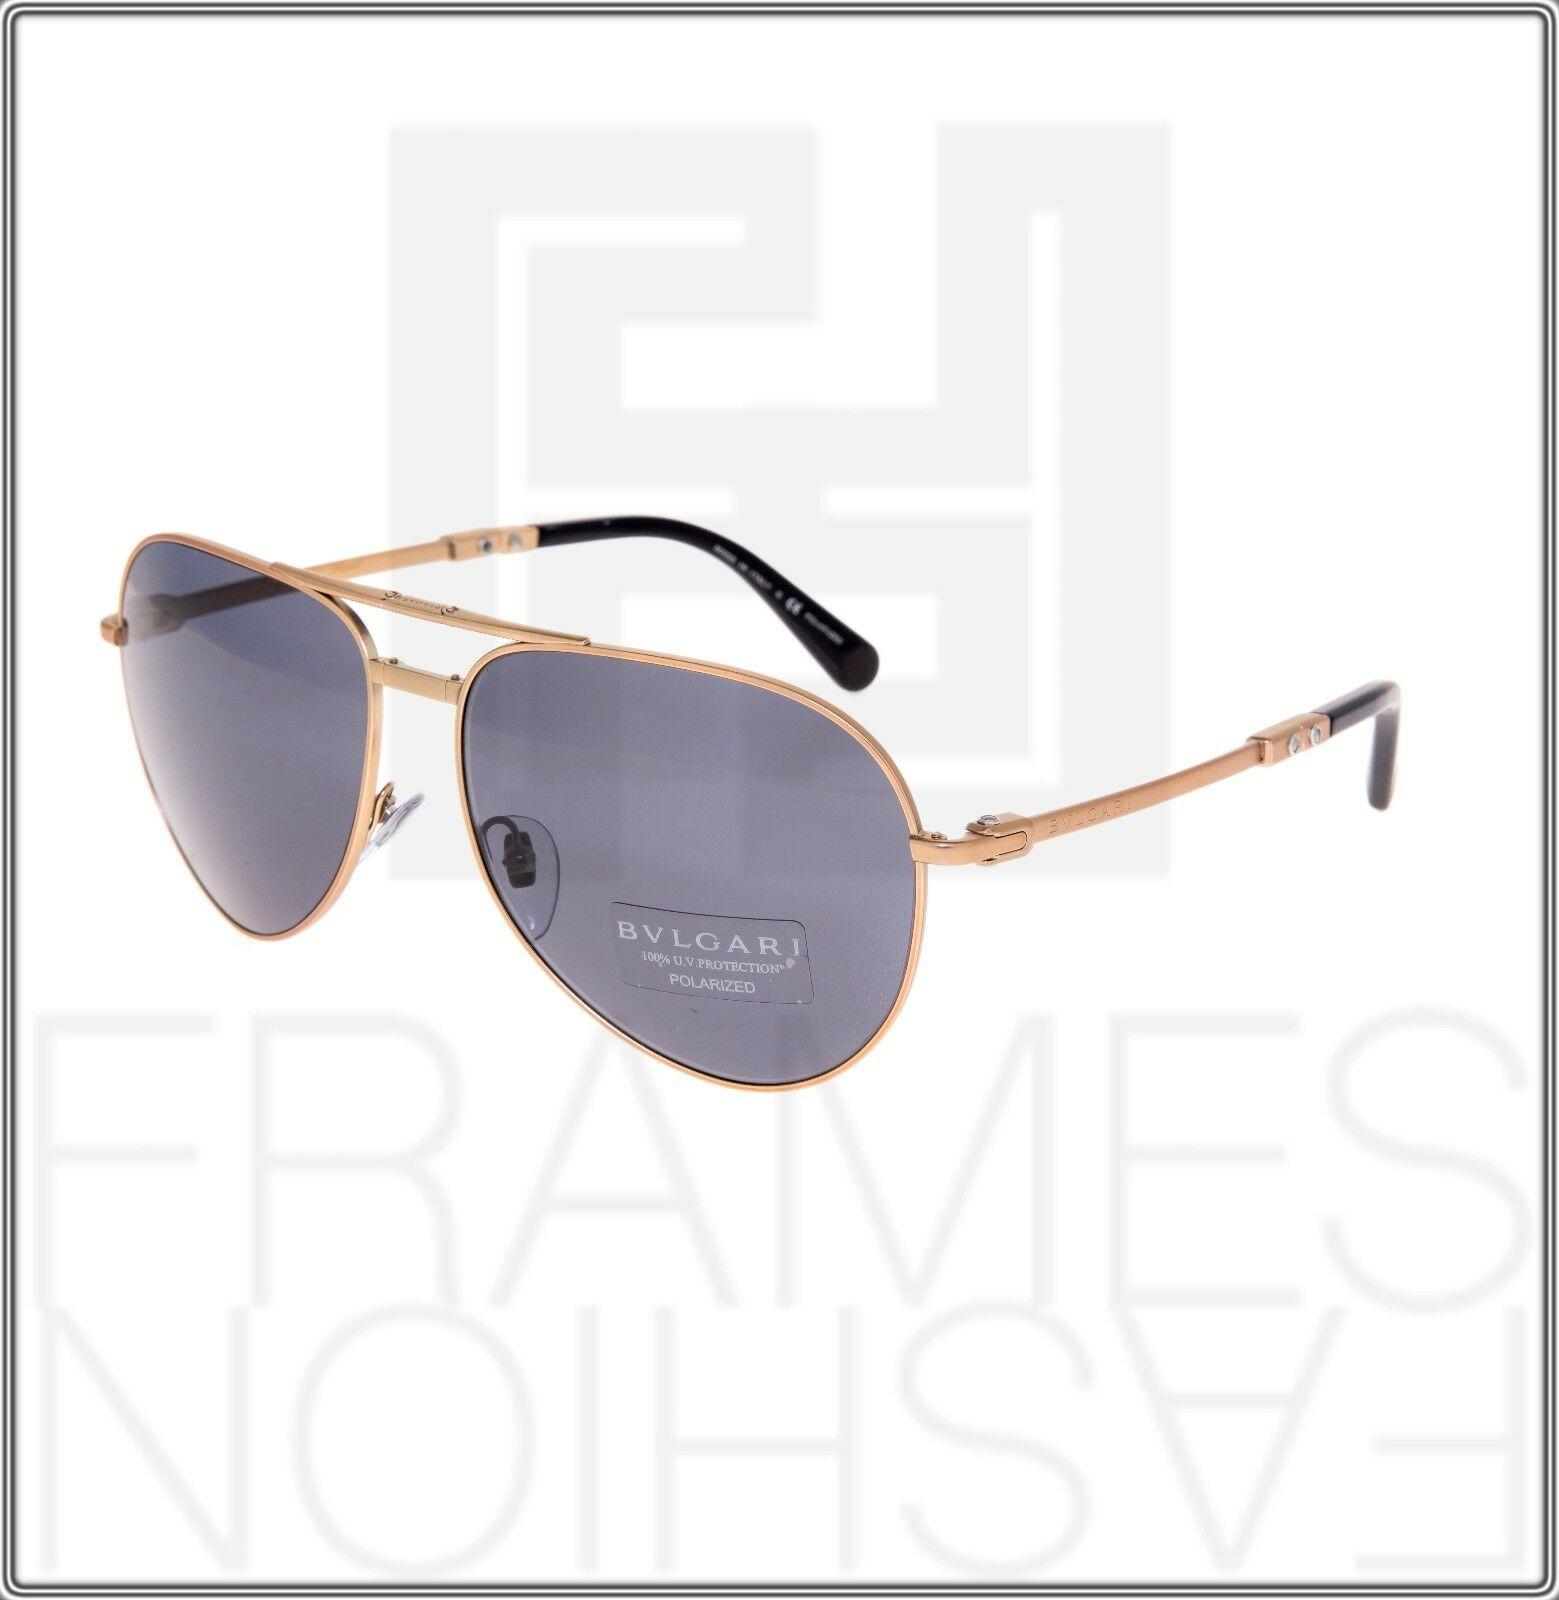 BVLGARI Le Gemme Black Rose Gold 18K Plated POLARIZED Foldable Sunglasses 5034